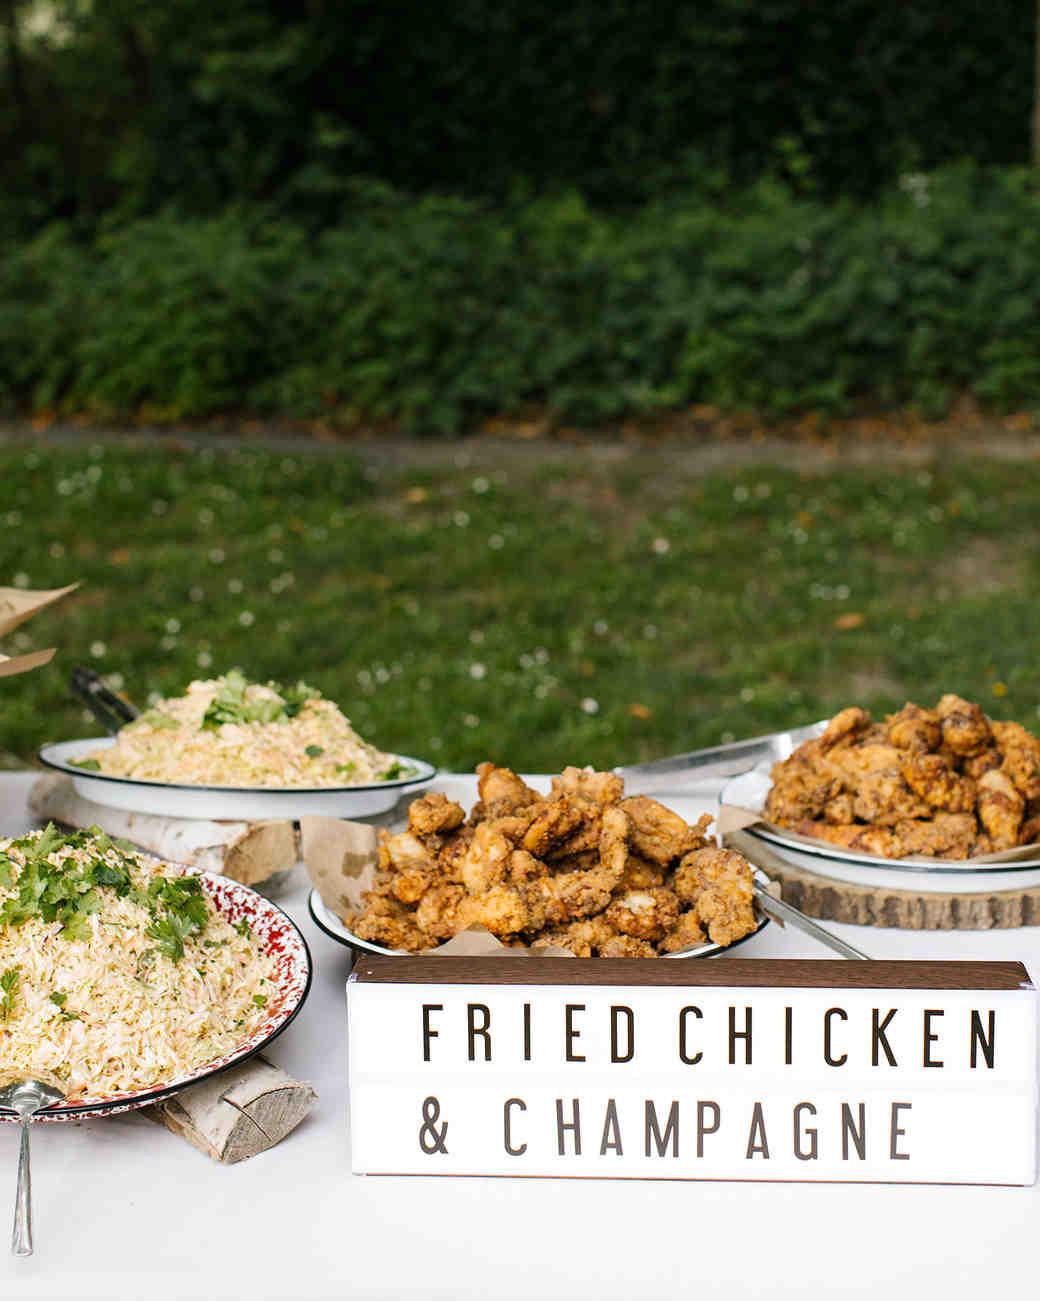 kendall jackson rehearsal dinner fried chicken